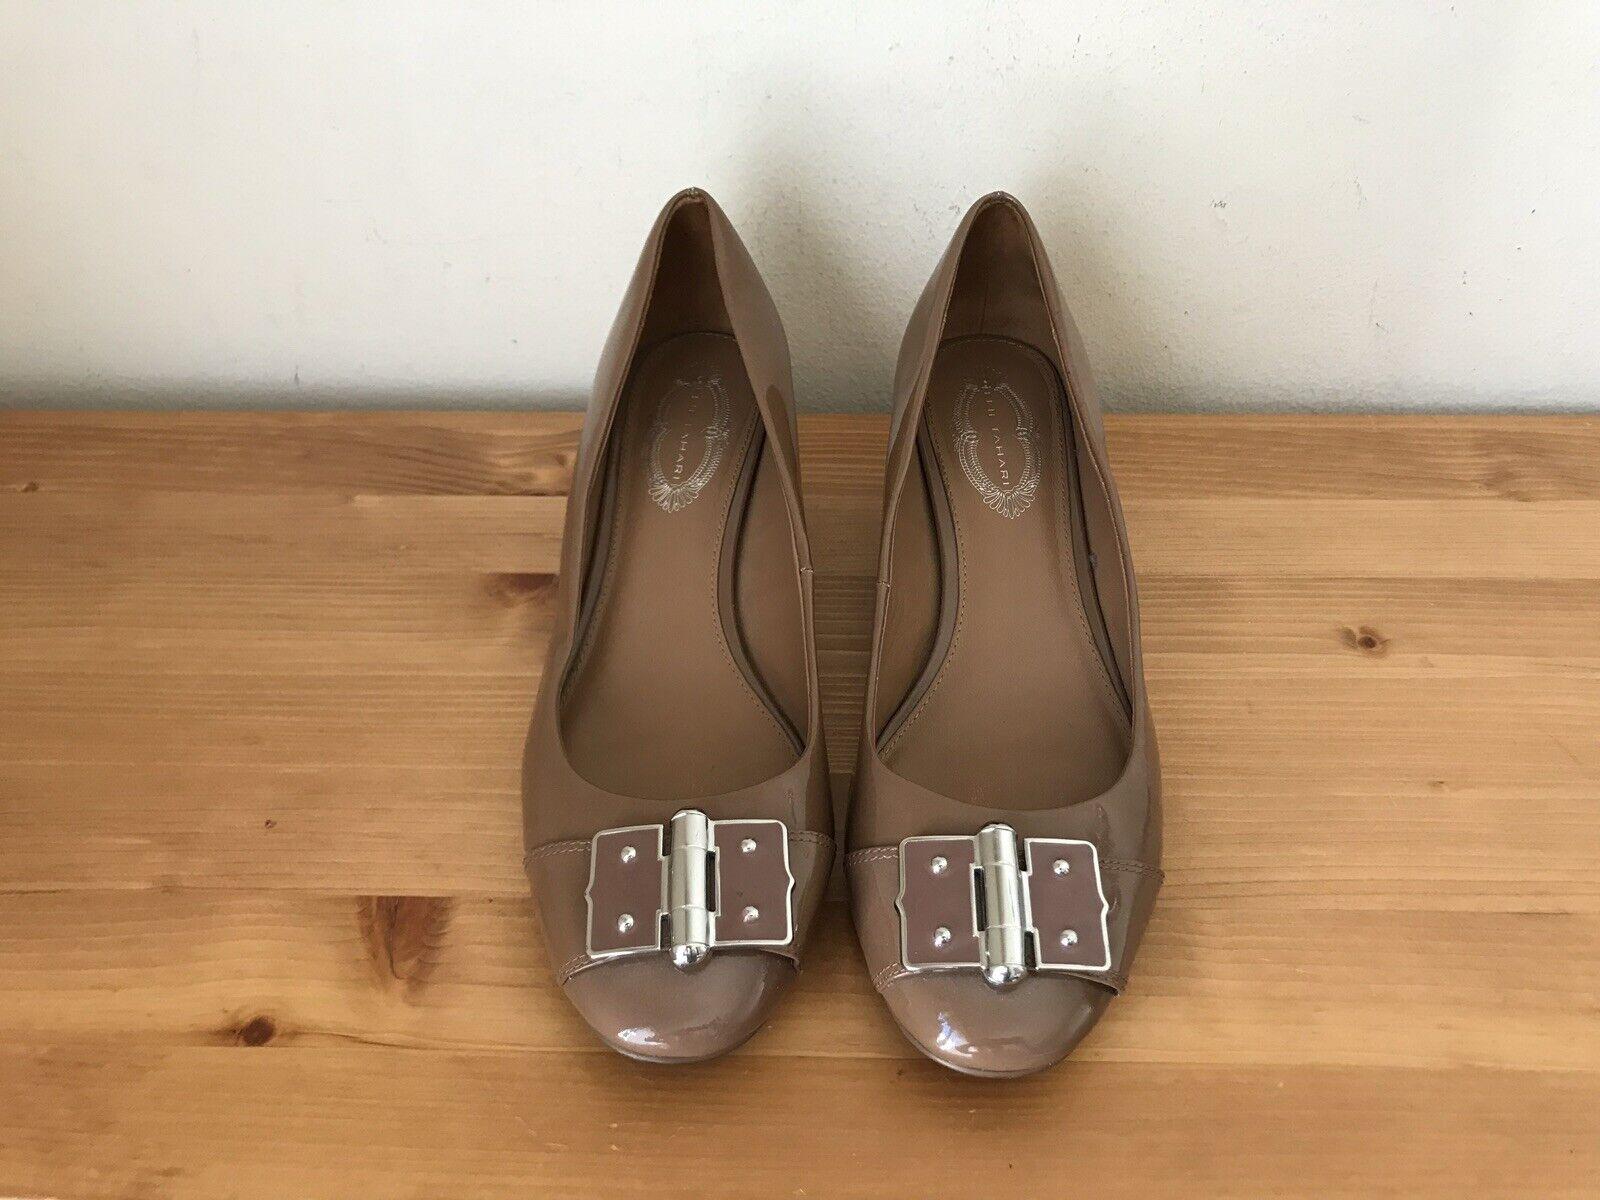 ElieTahari Patent Leather Kaplan Taupe Pump Women Size 40  US 9.5M